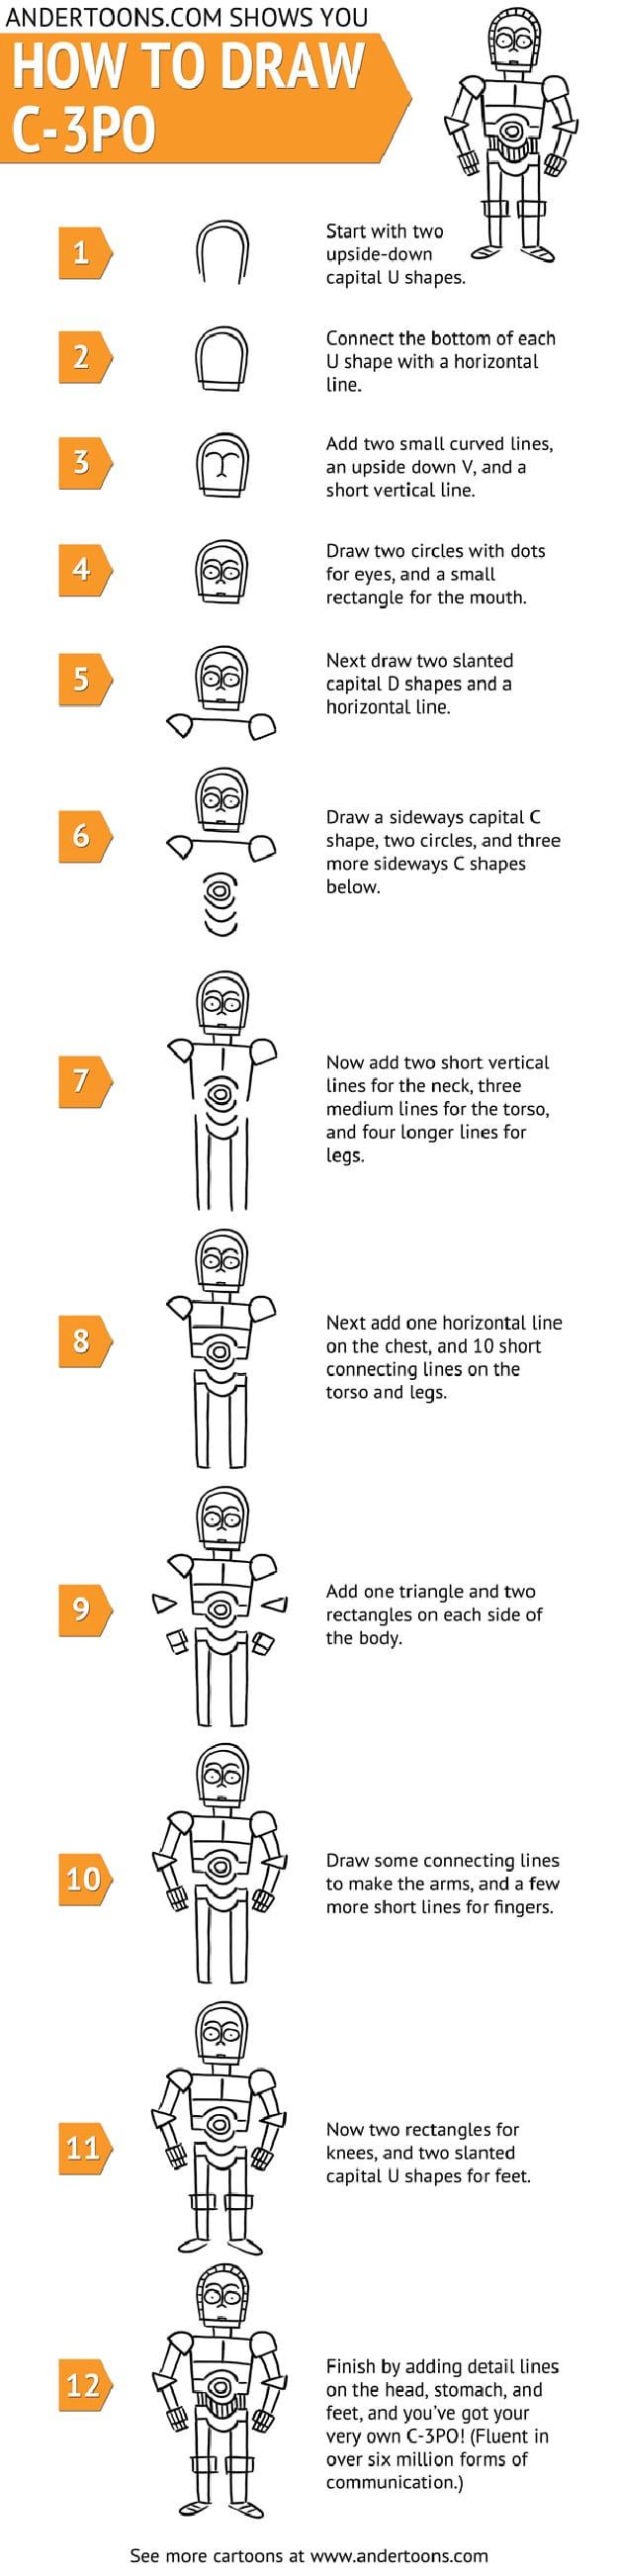 draw-c-3po-cartoon-chart